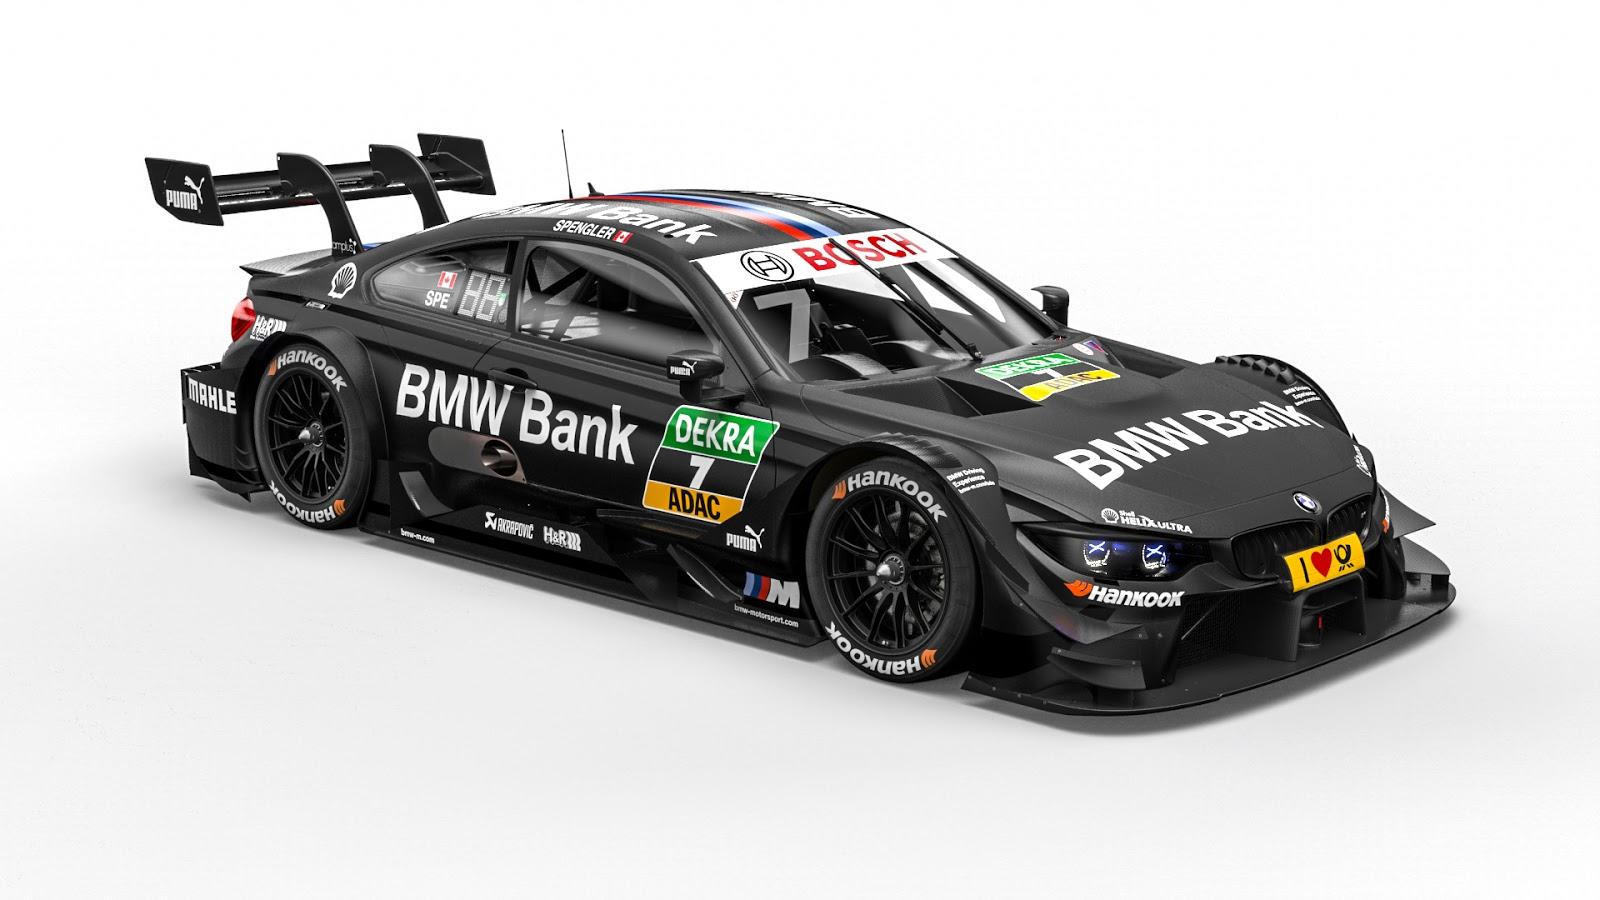 P90255226 highRes 21st april 2017 muni Η BMW Motorsport ξεκινά τη νέα σεζόν με ισχυρούς εταίρους Akrapovič, BMW, Bmw Bank, BMW M4 DTM, BMW M6, BMW M6 GT3, BMW Motorsport, DTM, Red Bull, Samsung, Shell, αγωνες